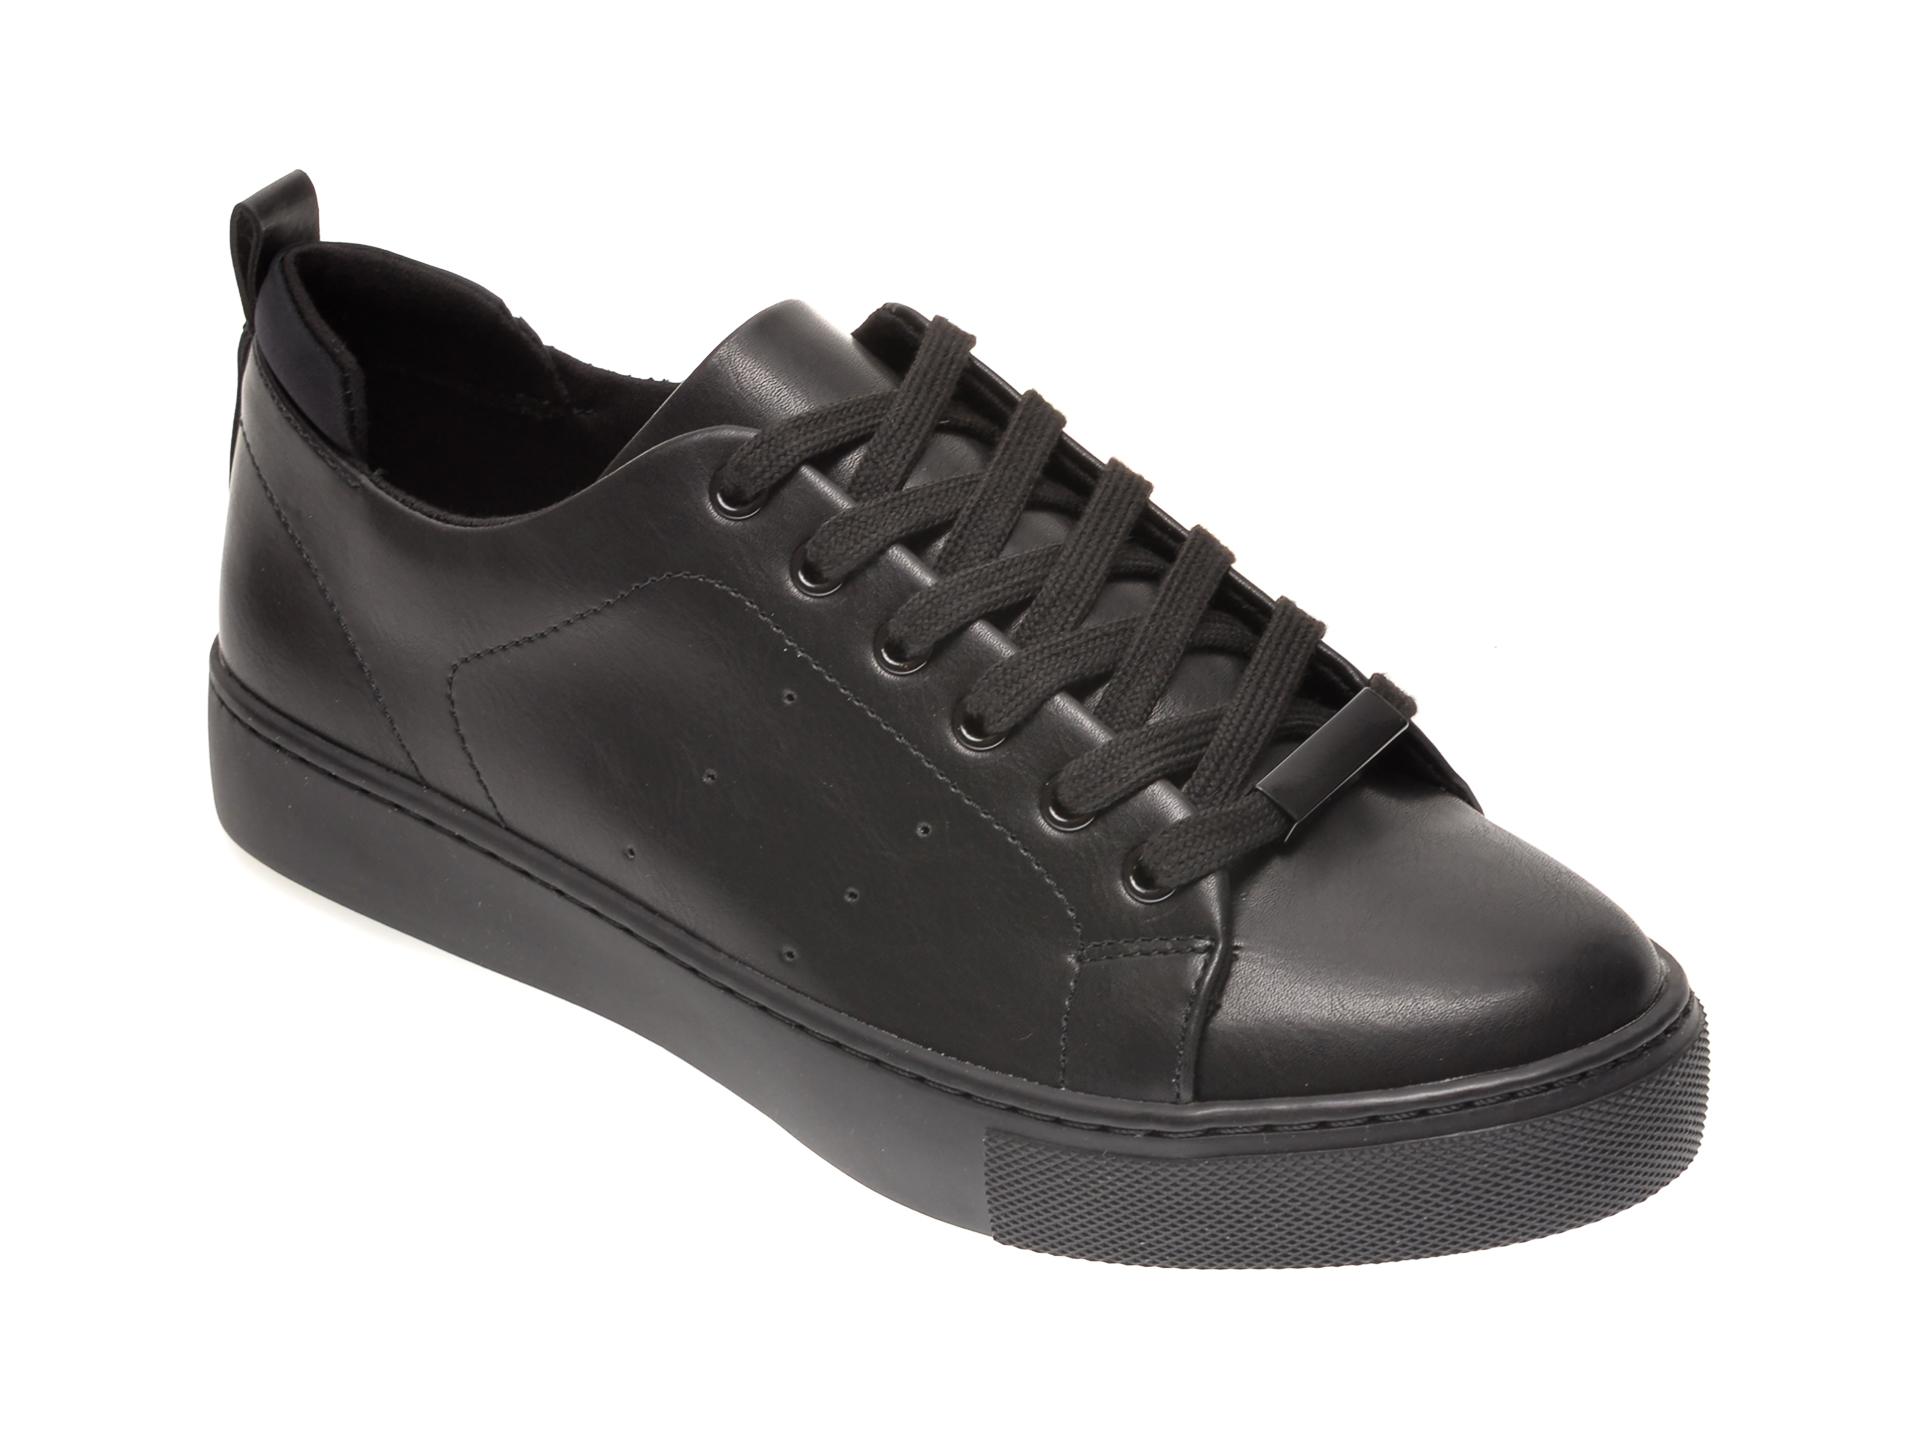 Pantofi sport ALDO negri, Mirarevia968, din piele ecologica imagine